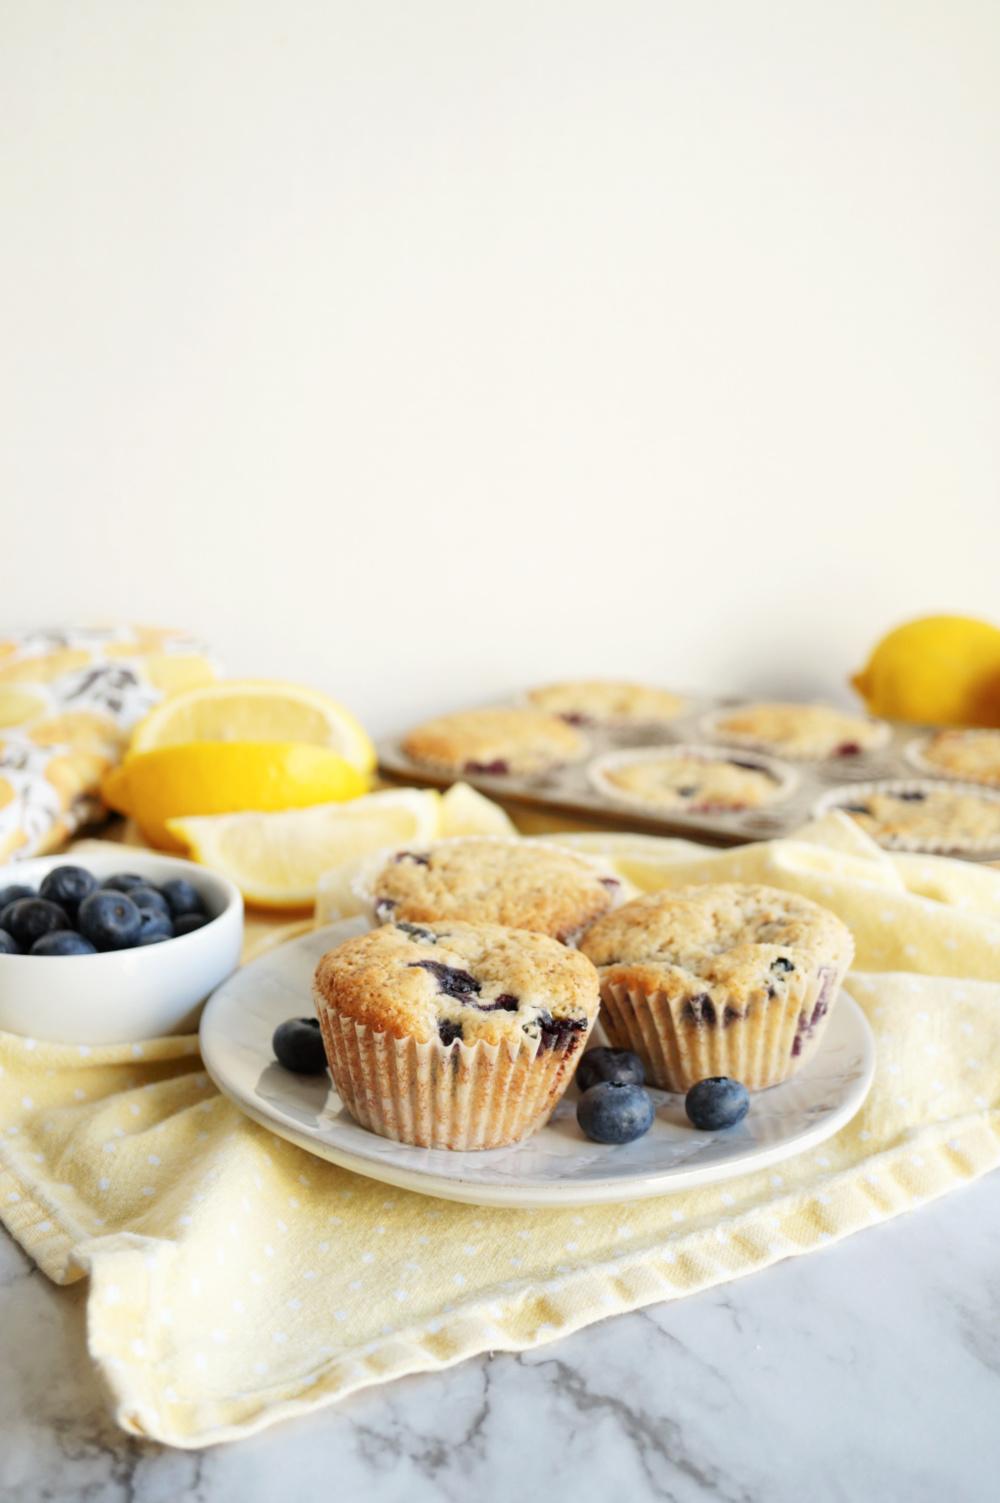 three muffins on plate